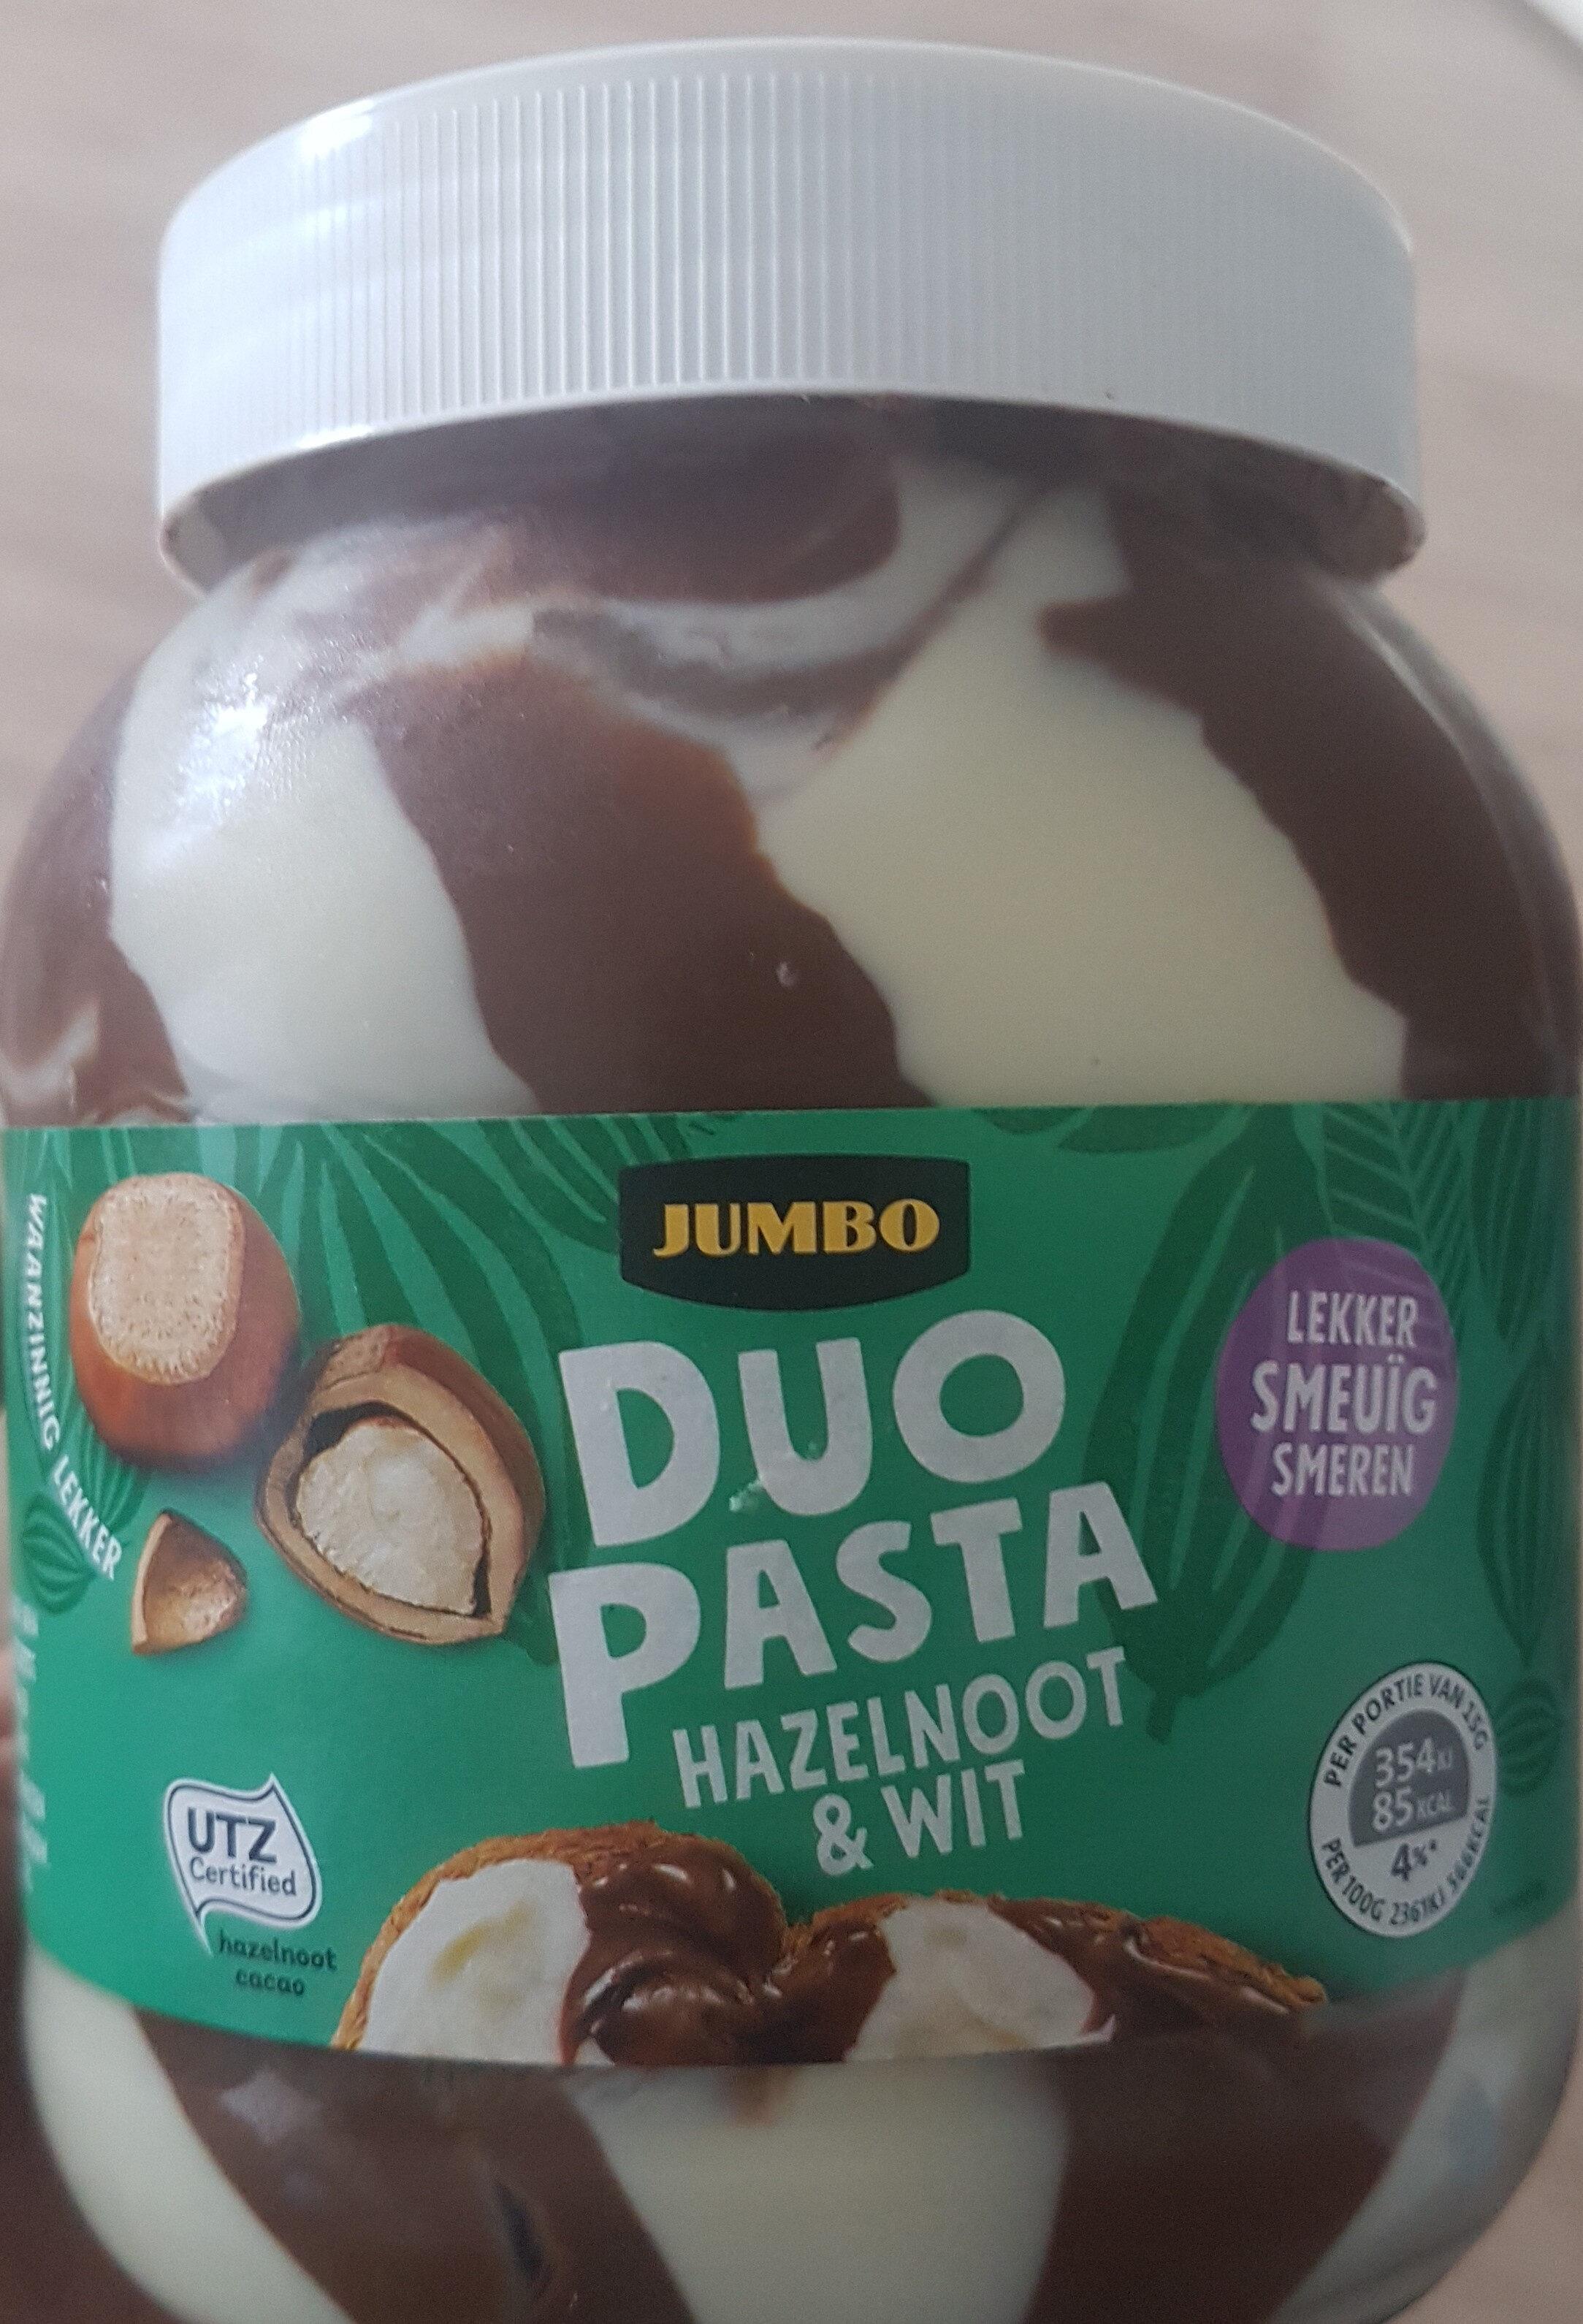 jumbo duo pasta hazelnoot & wit - Product - nl